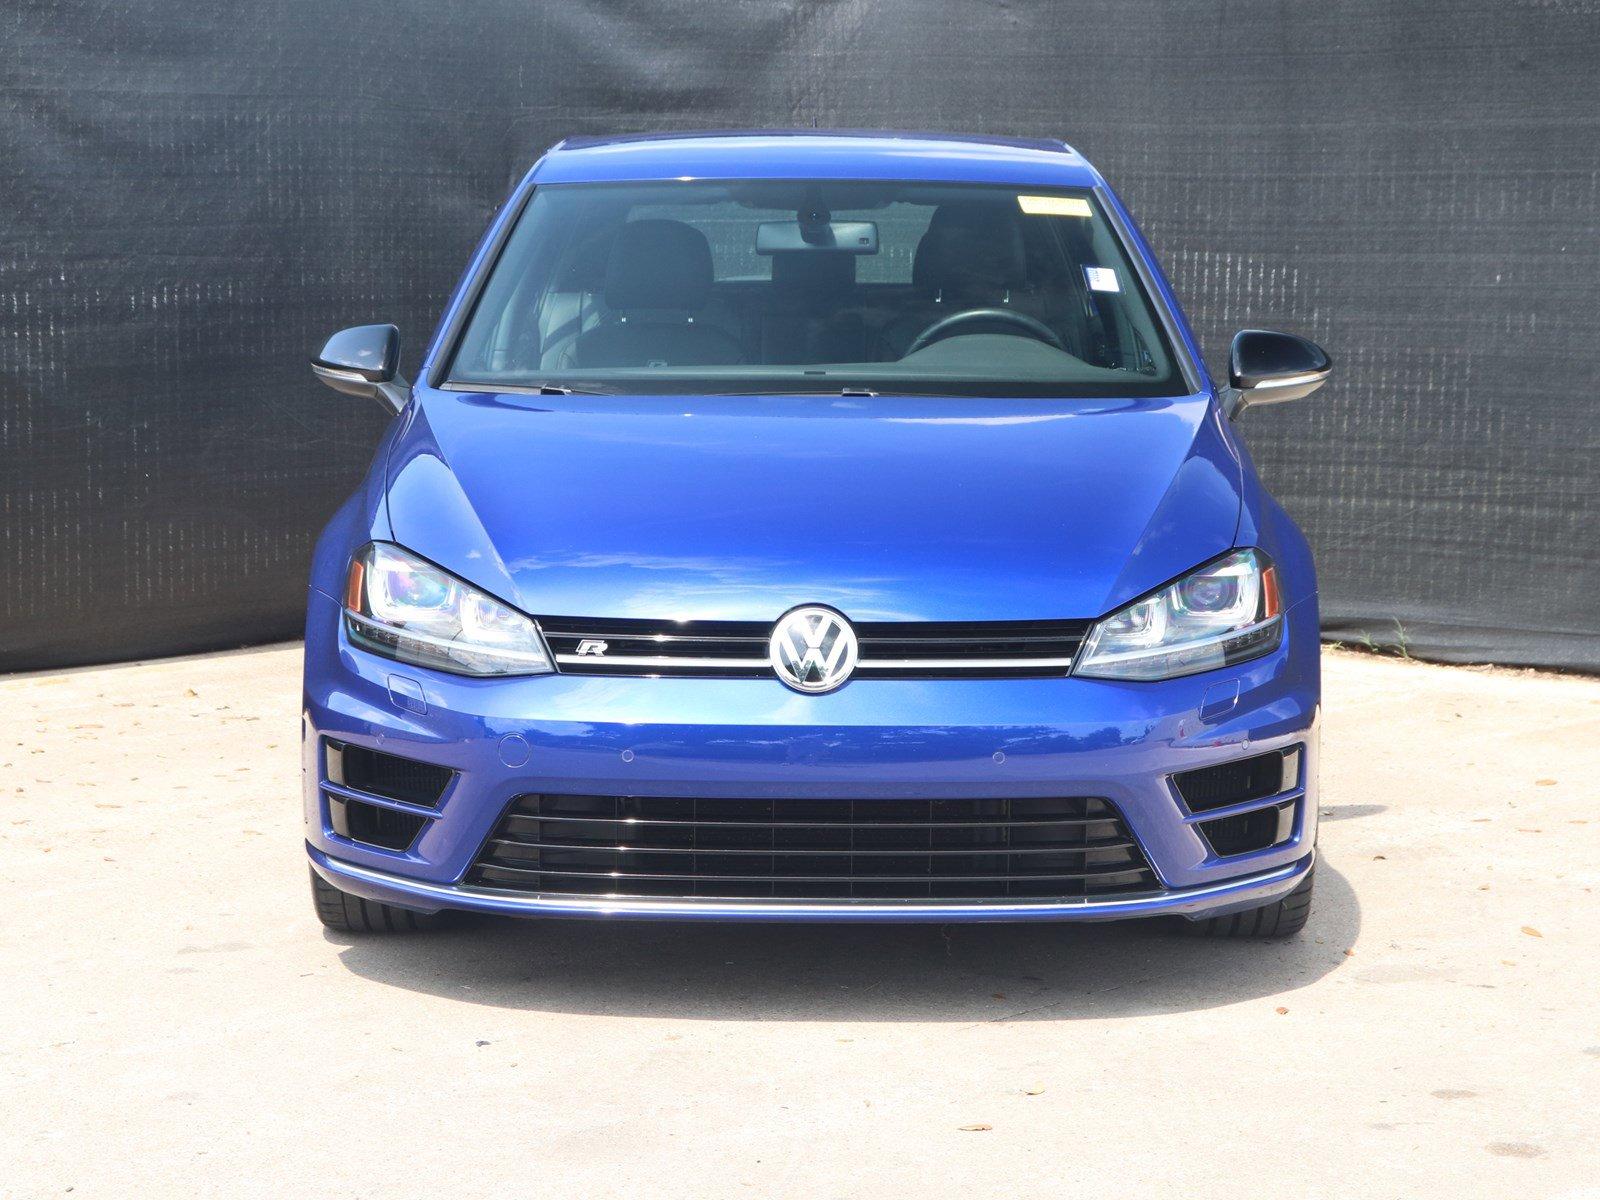 Pre-Owned 2015 Volkswagen Golf R 4dr HB w/DCC/Nav